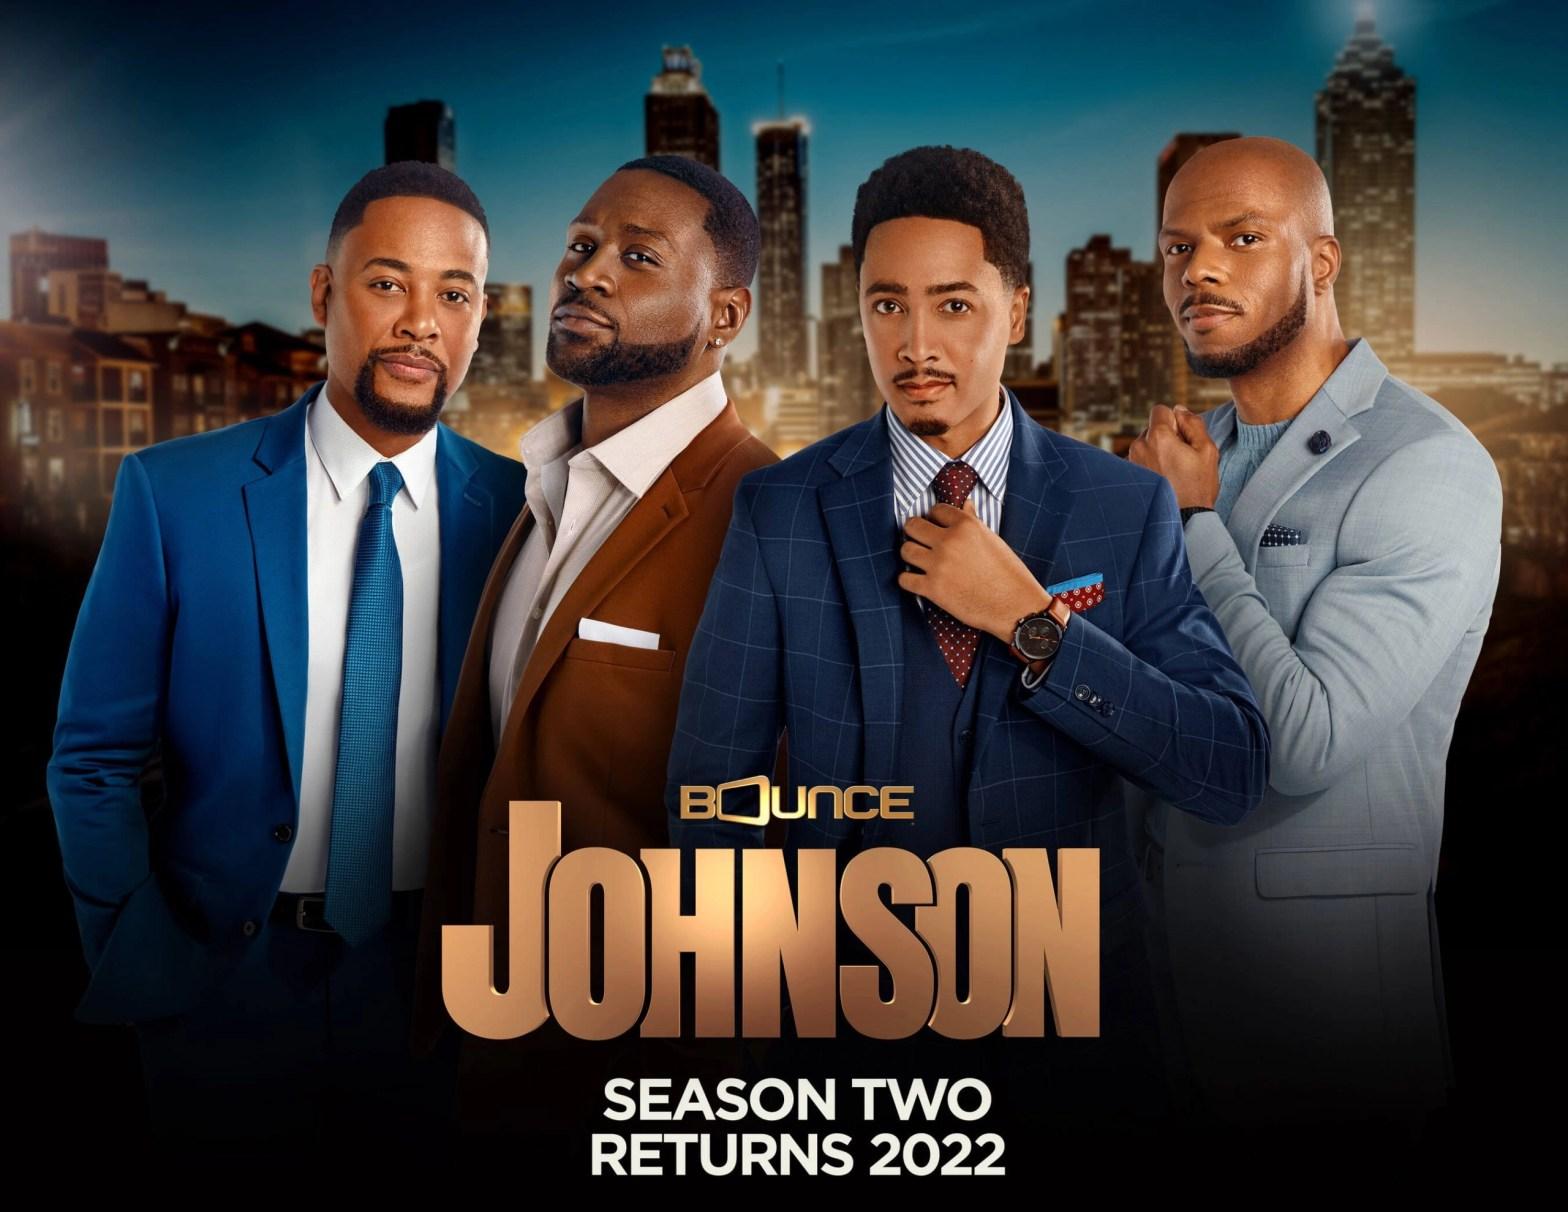 Bounce Renews Johnson For Second Season, First Season Finale Premieres This Sunday, Oct. 3 @ 8:00 P.M. ET/PT